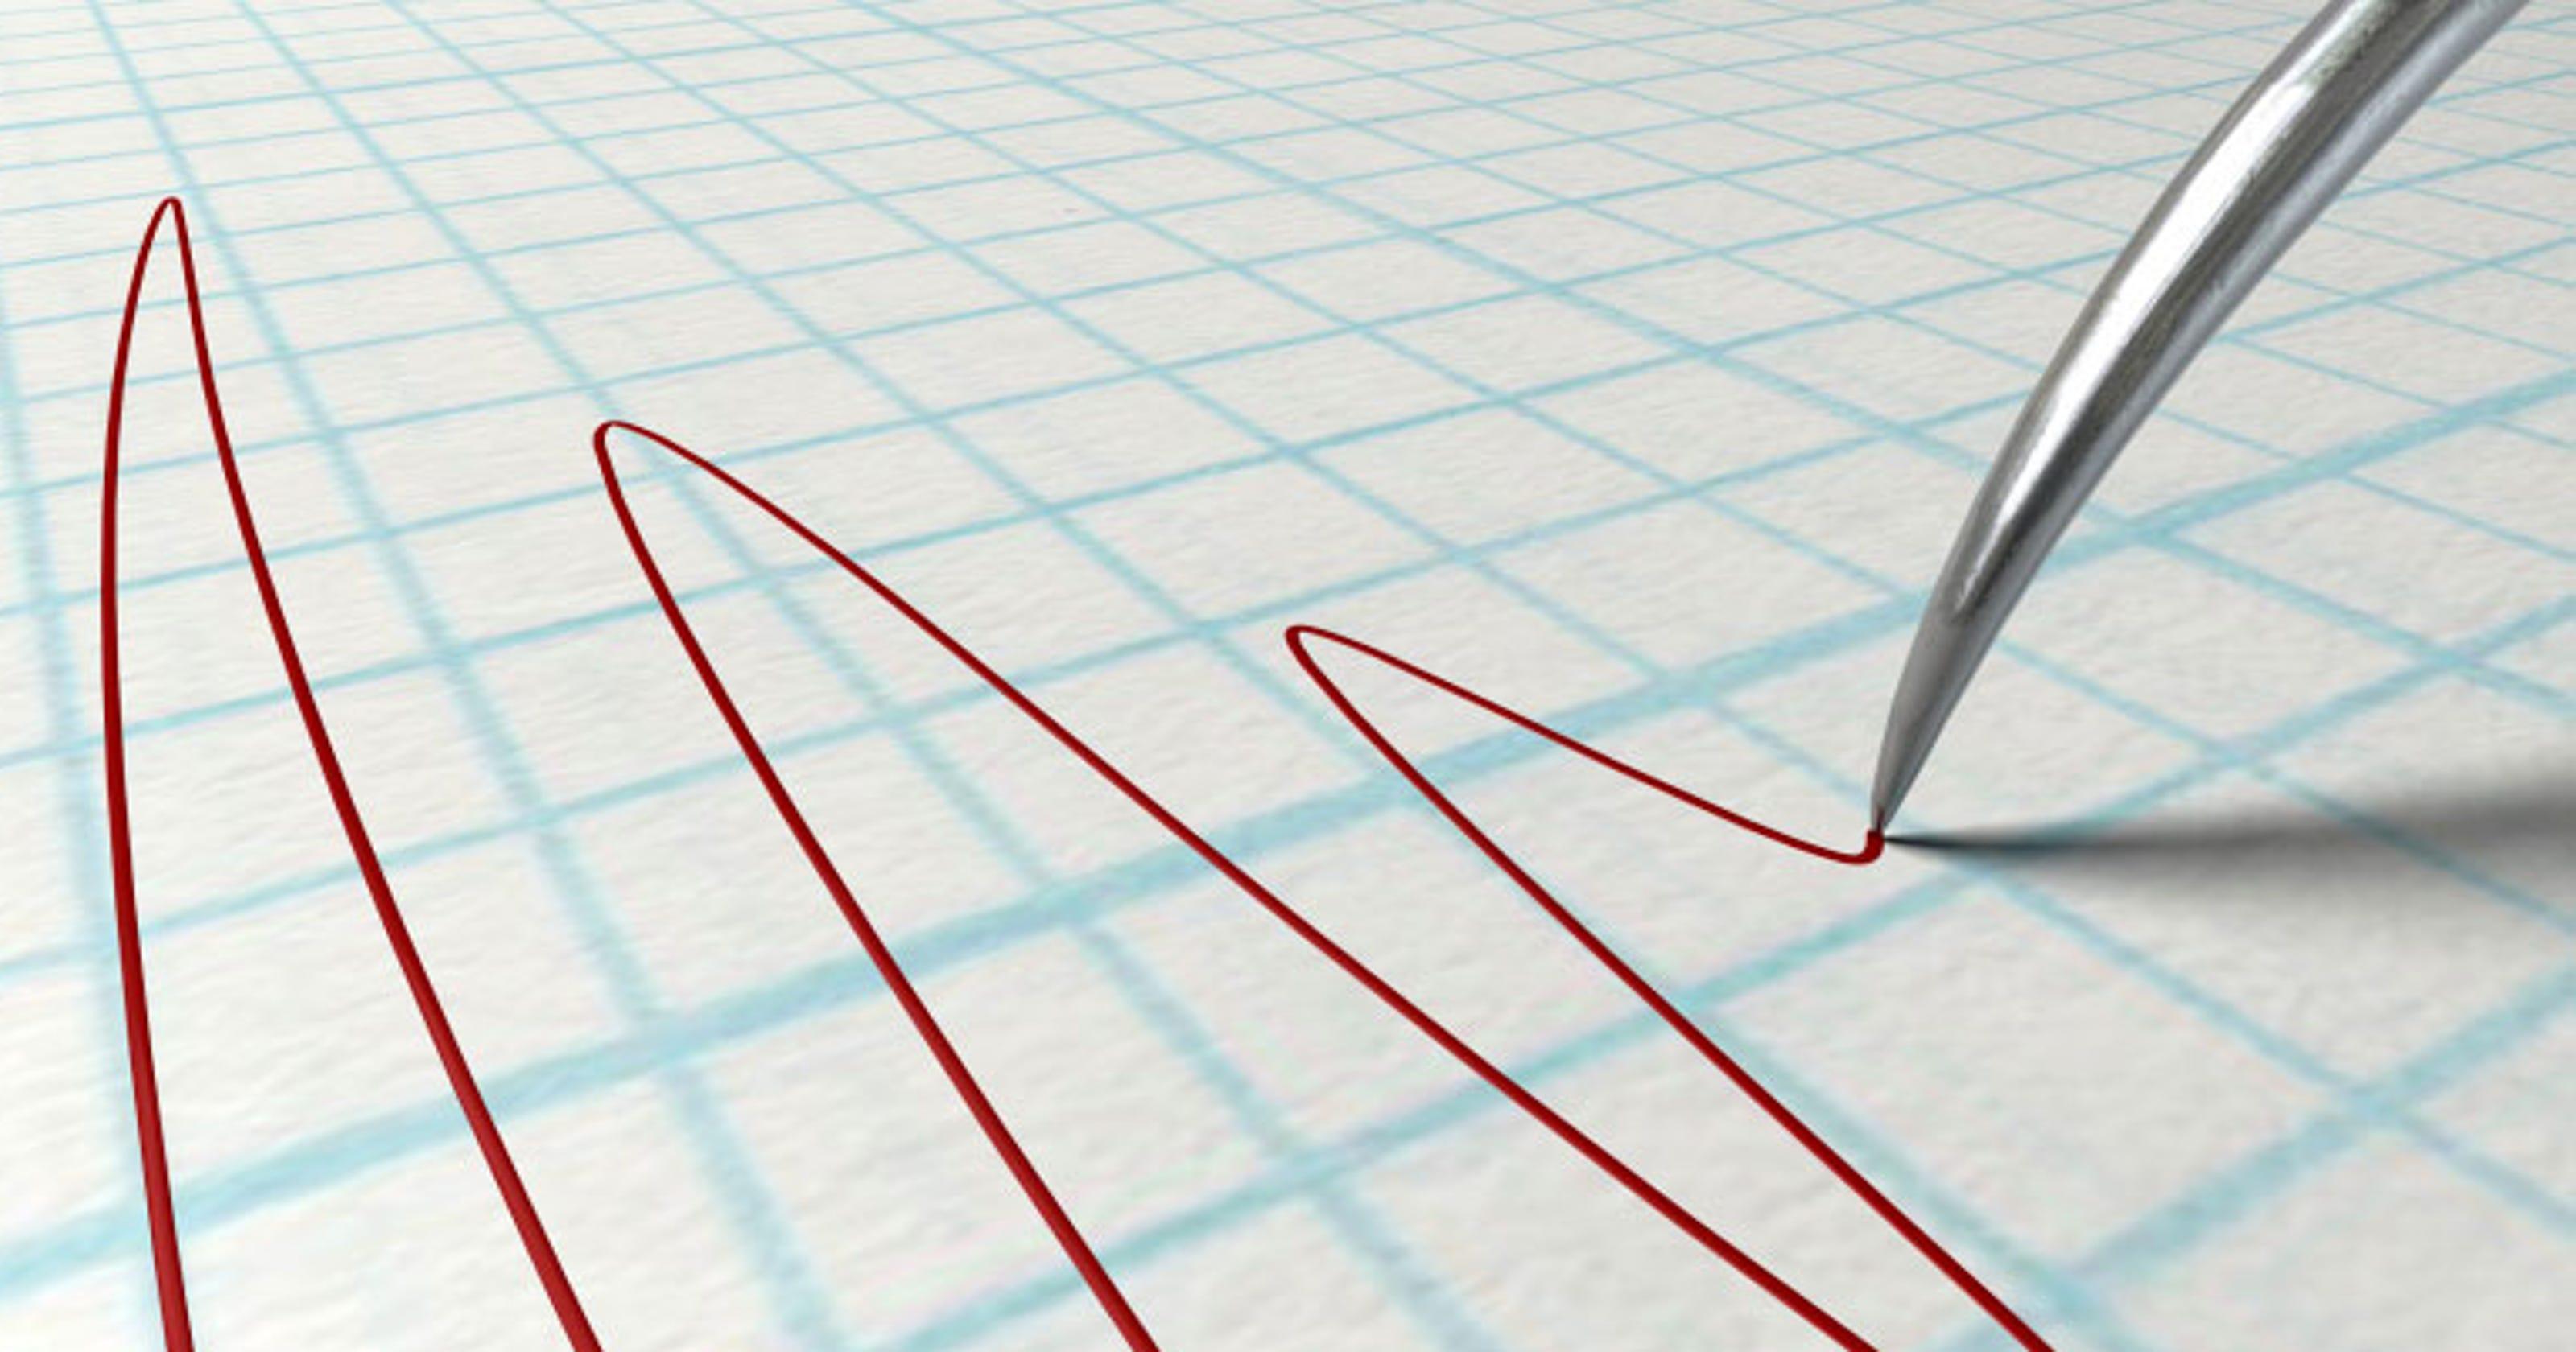 A brief history of earthquake activity in Arizona